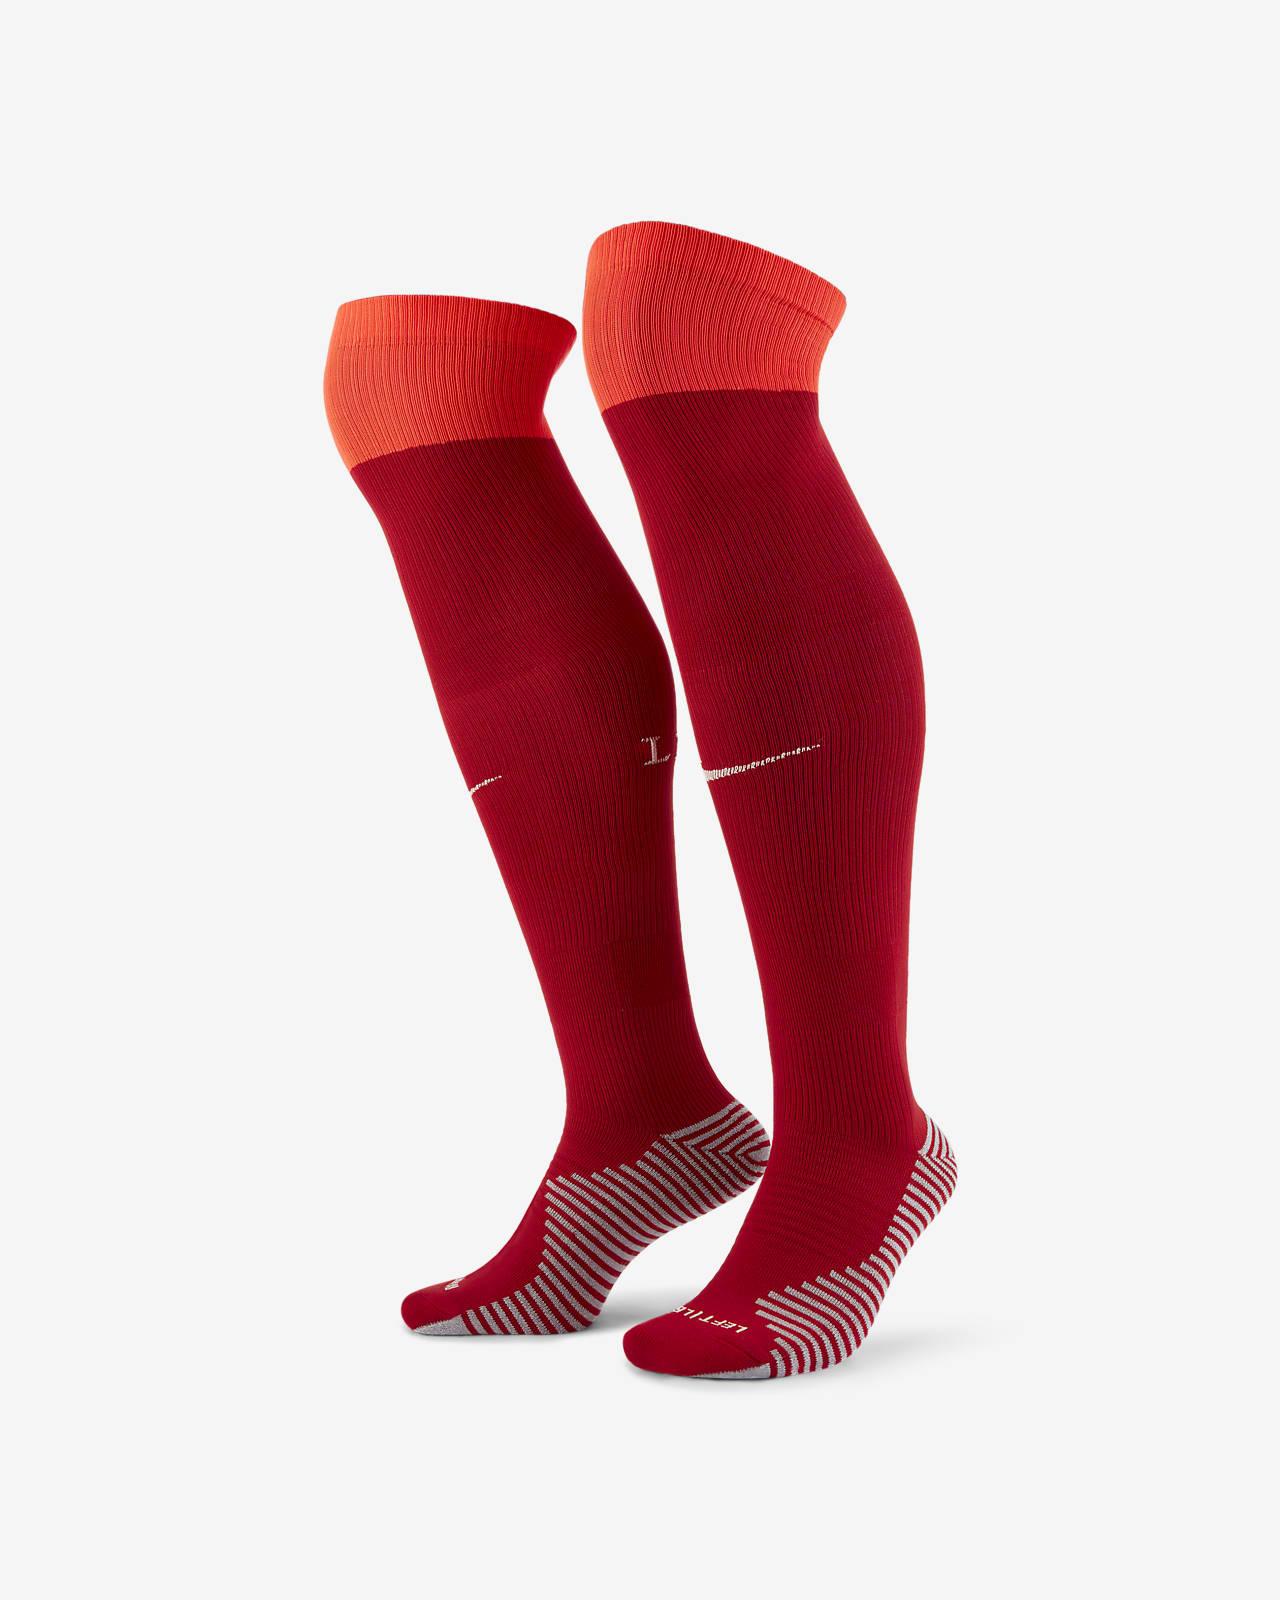 Liverpool F.C. 2021/22 Stadium Home Over-the-Calf Football Socks